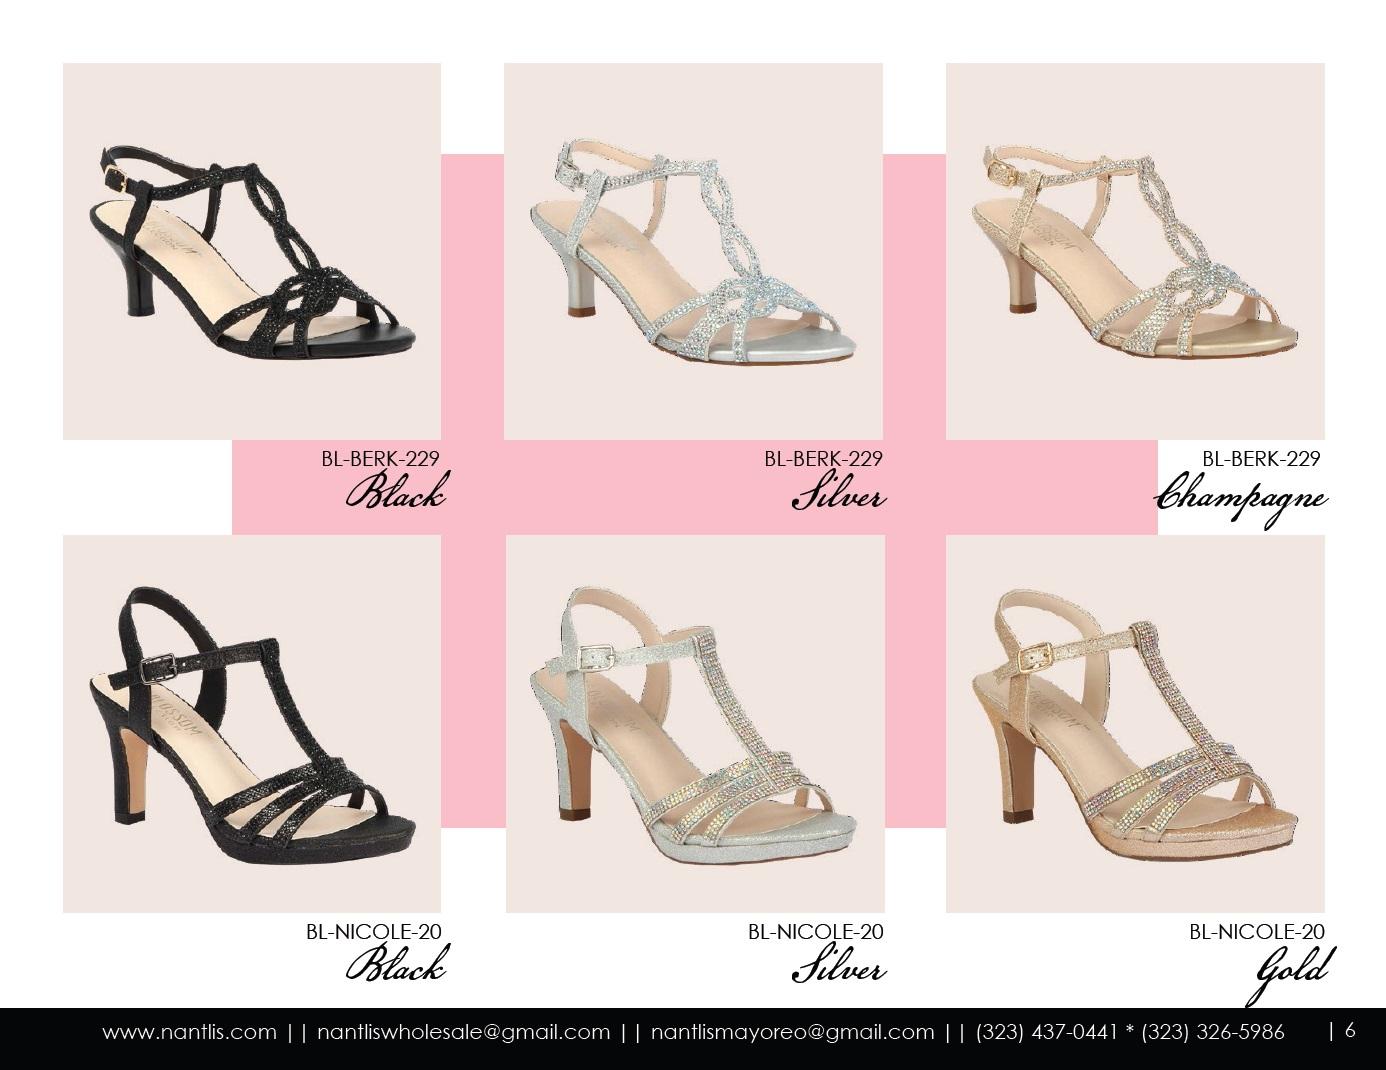 Nantlis Vol BL50 Zapatos de Mujer mayoreo Catalogo Wholesale womens Shoes_Page_06